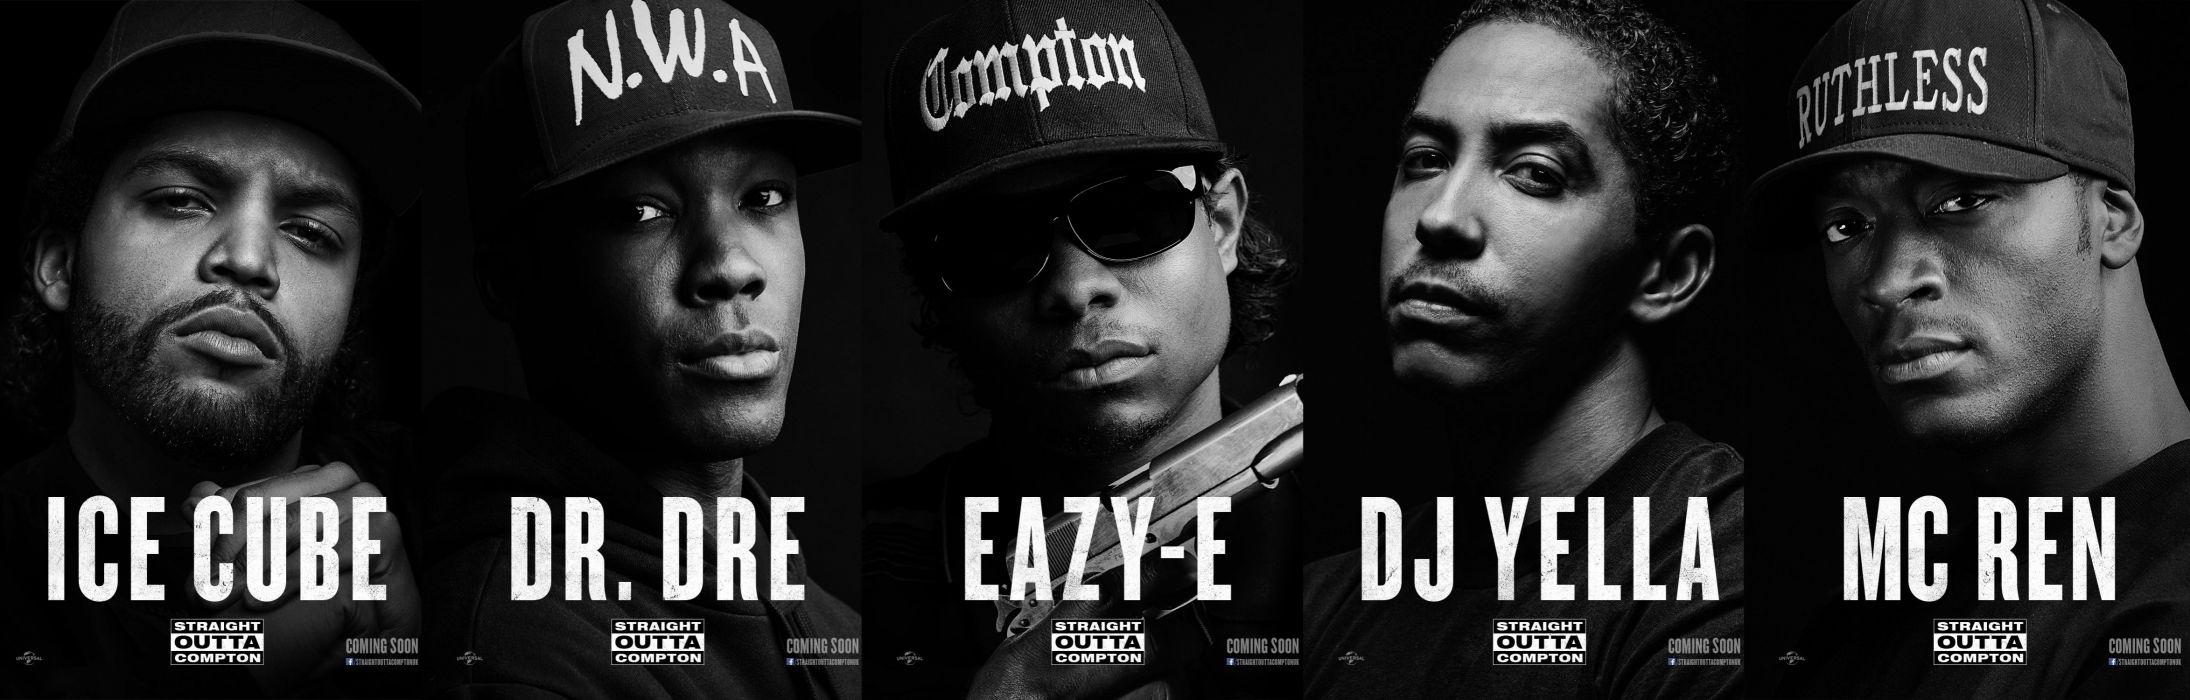 straight outta compton rap rapper hip hop gangsta nwa biography